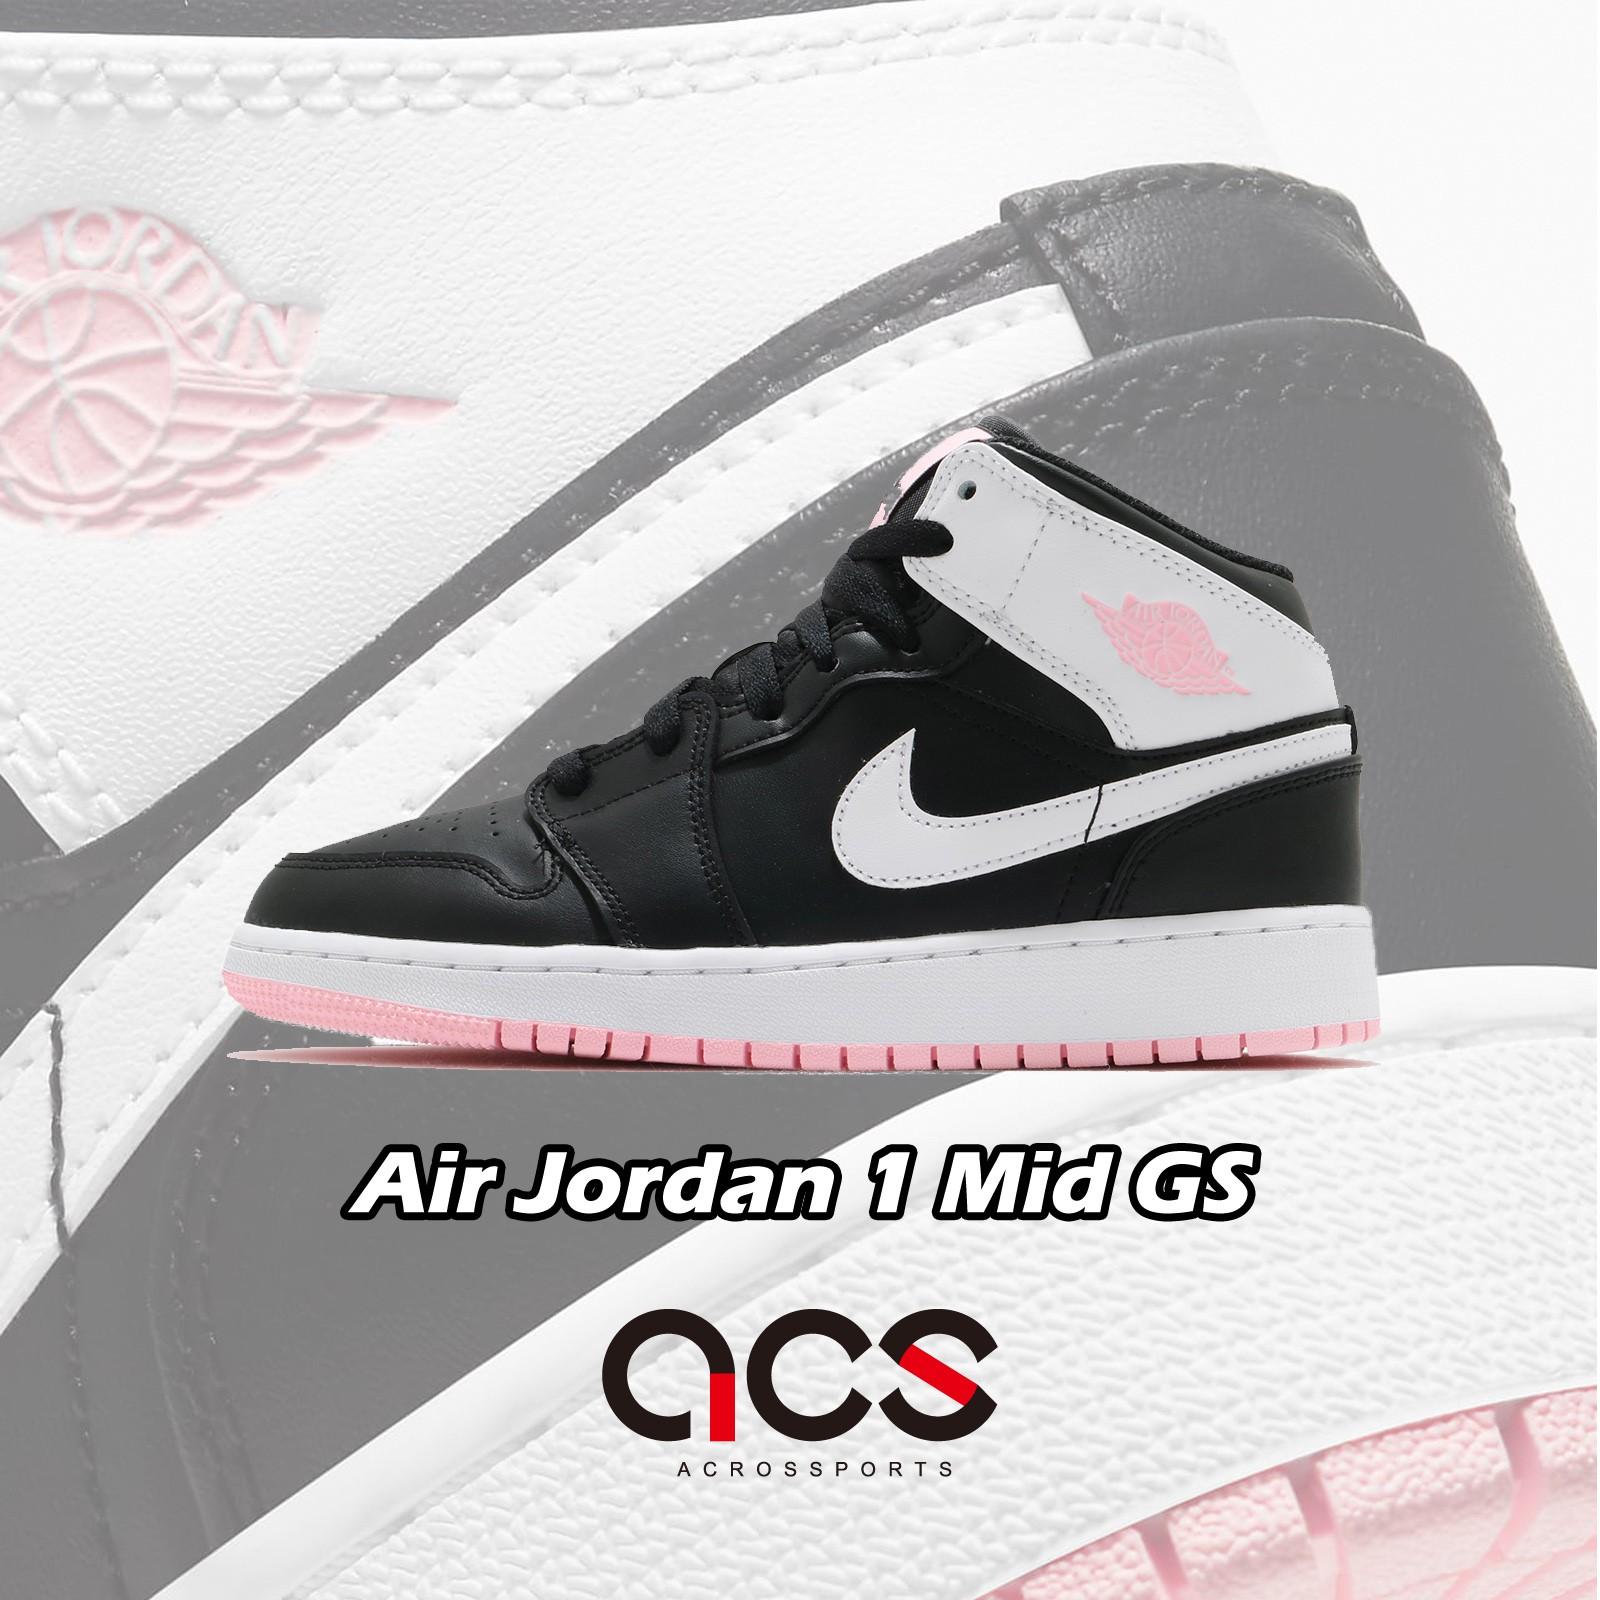 Nike Air Jordan 1 Mid GS 黑 白 粉紅 熊貓 大童鞋 喬丹 女鞋【ACS】 555112-061